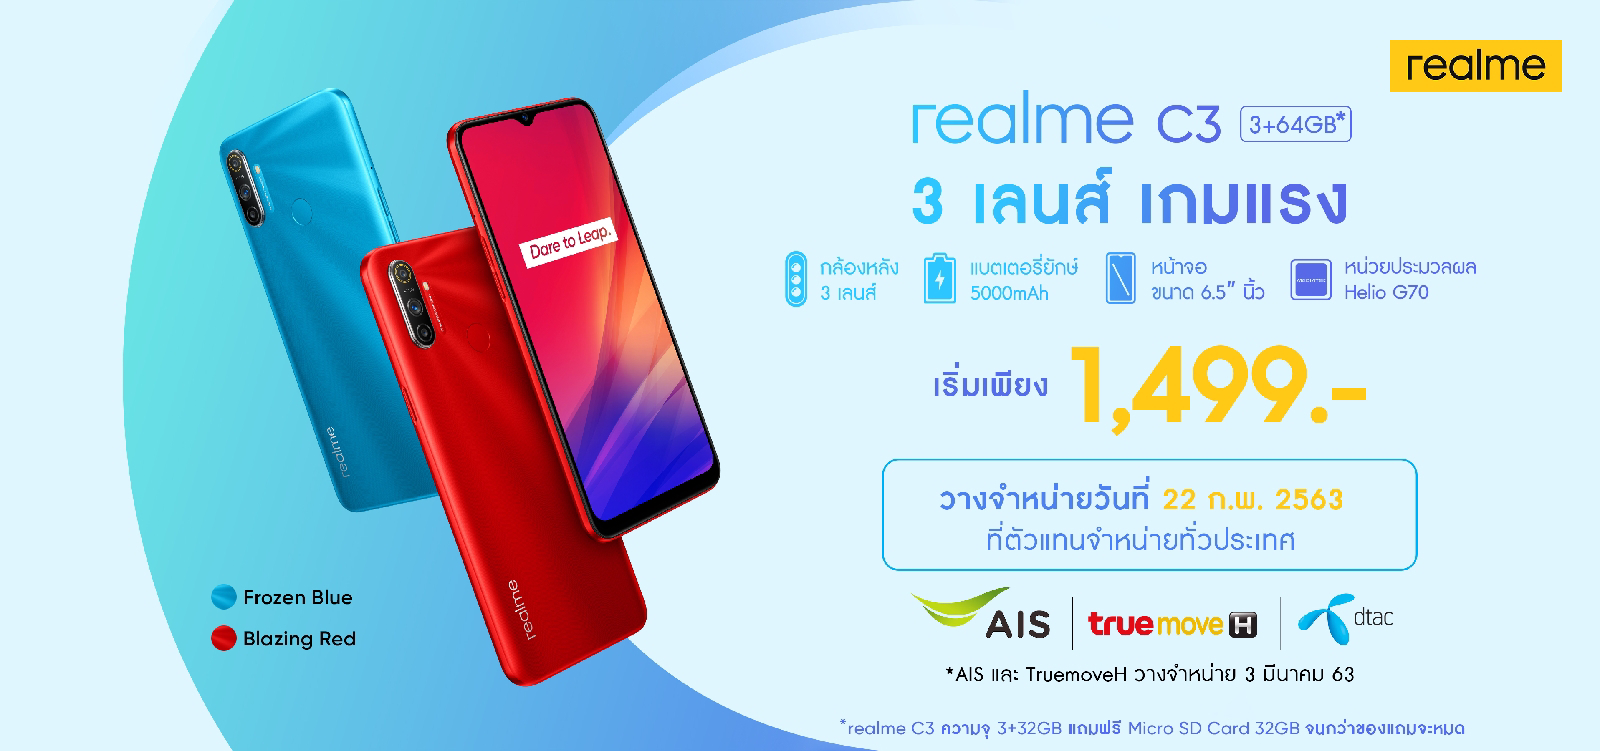 realme เปิดตัว realme C3 สมาร์ทโฟนสุดคุ้มอัดแน่นด้วย ประสิทธิภาพทรงพลังเหนือชั้น